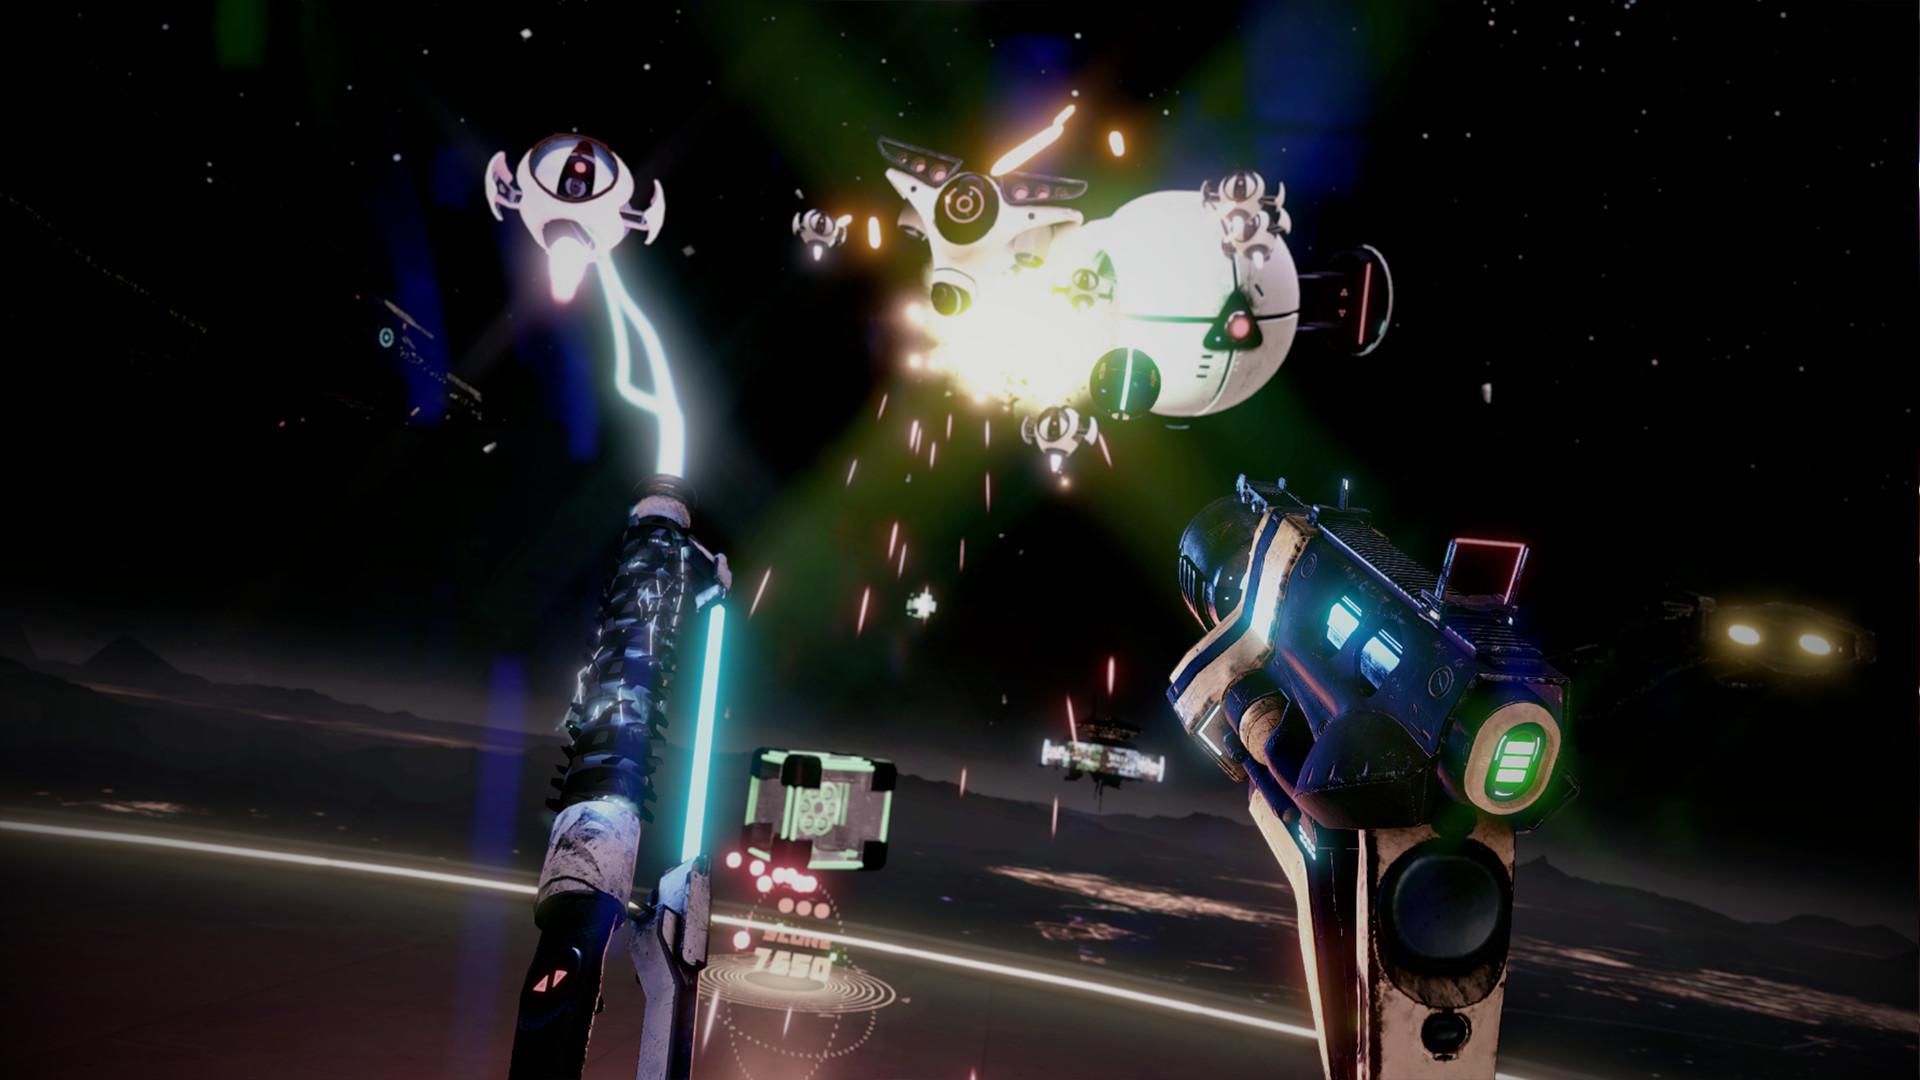 Best Oculus Quest games 2021: space pirate trainer